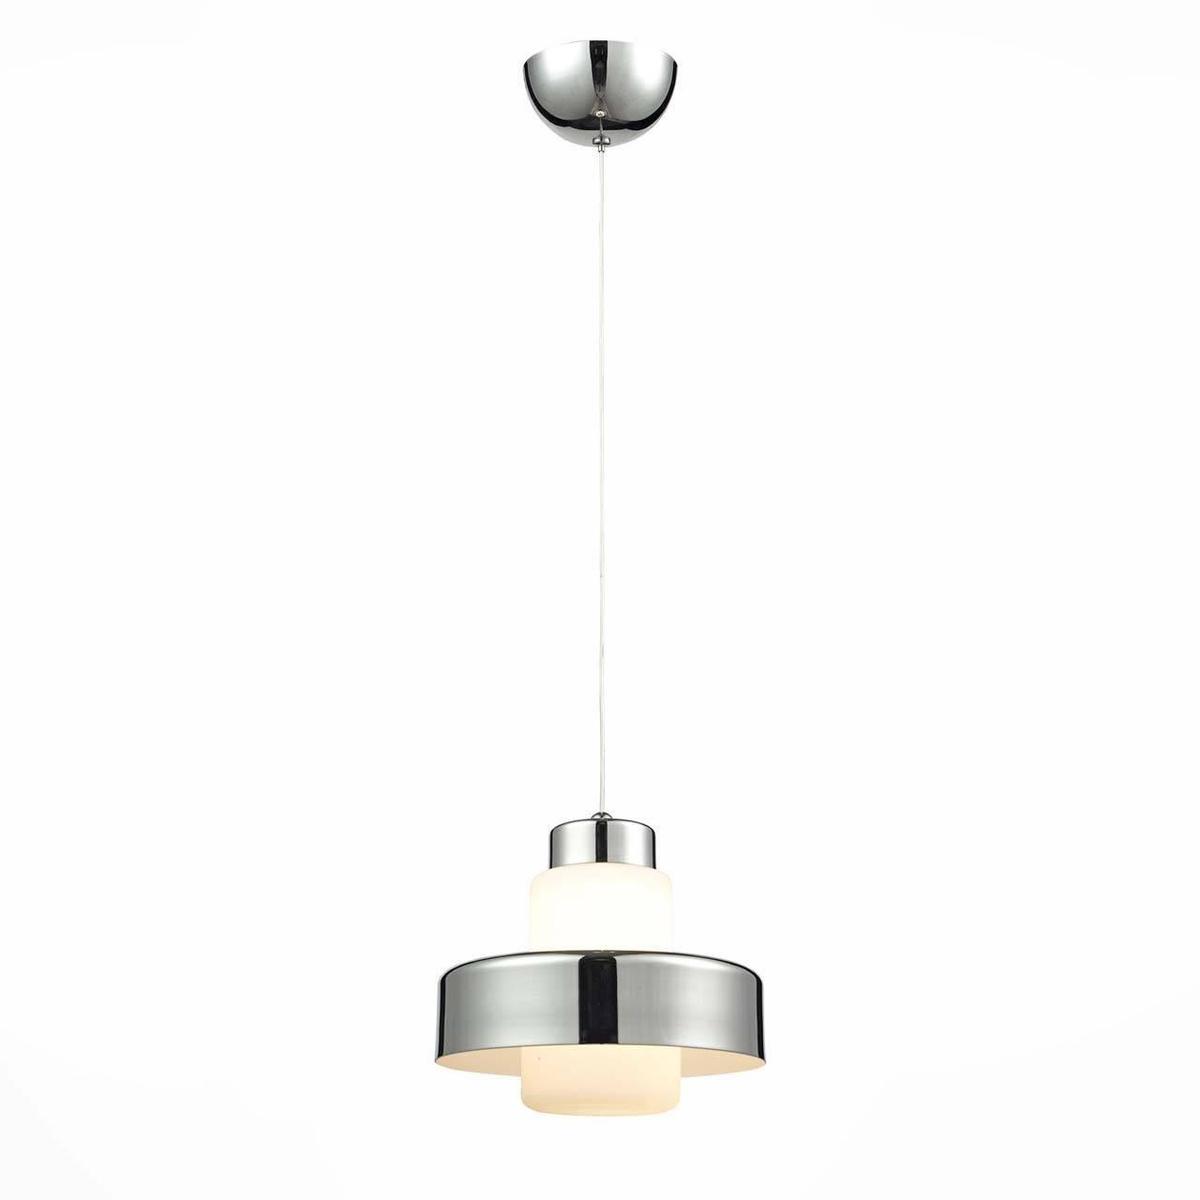 Подвесной светильник ST Luce SL345.013.01, LED, 5 Вт #1